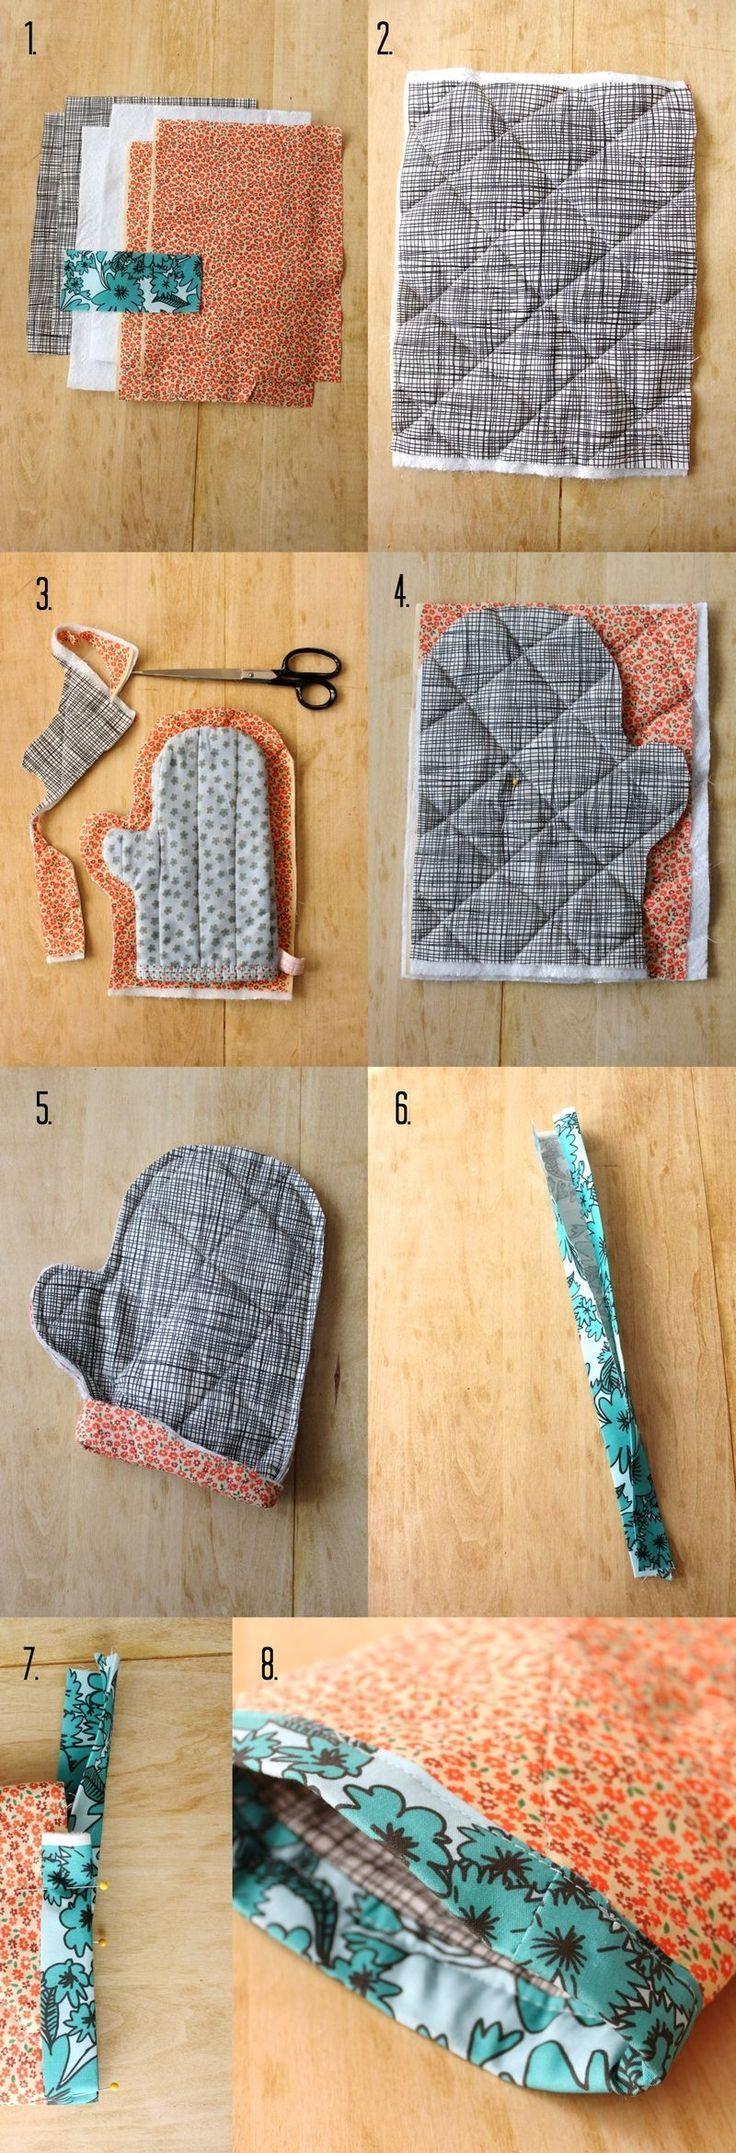 DIY Oven Mit diy craft crafts easy crafts craft idea diy ideas home diy sewing…